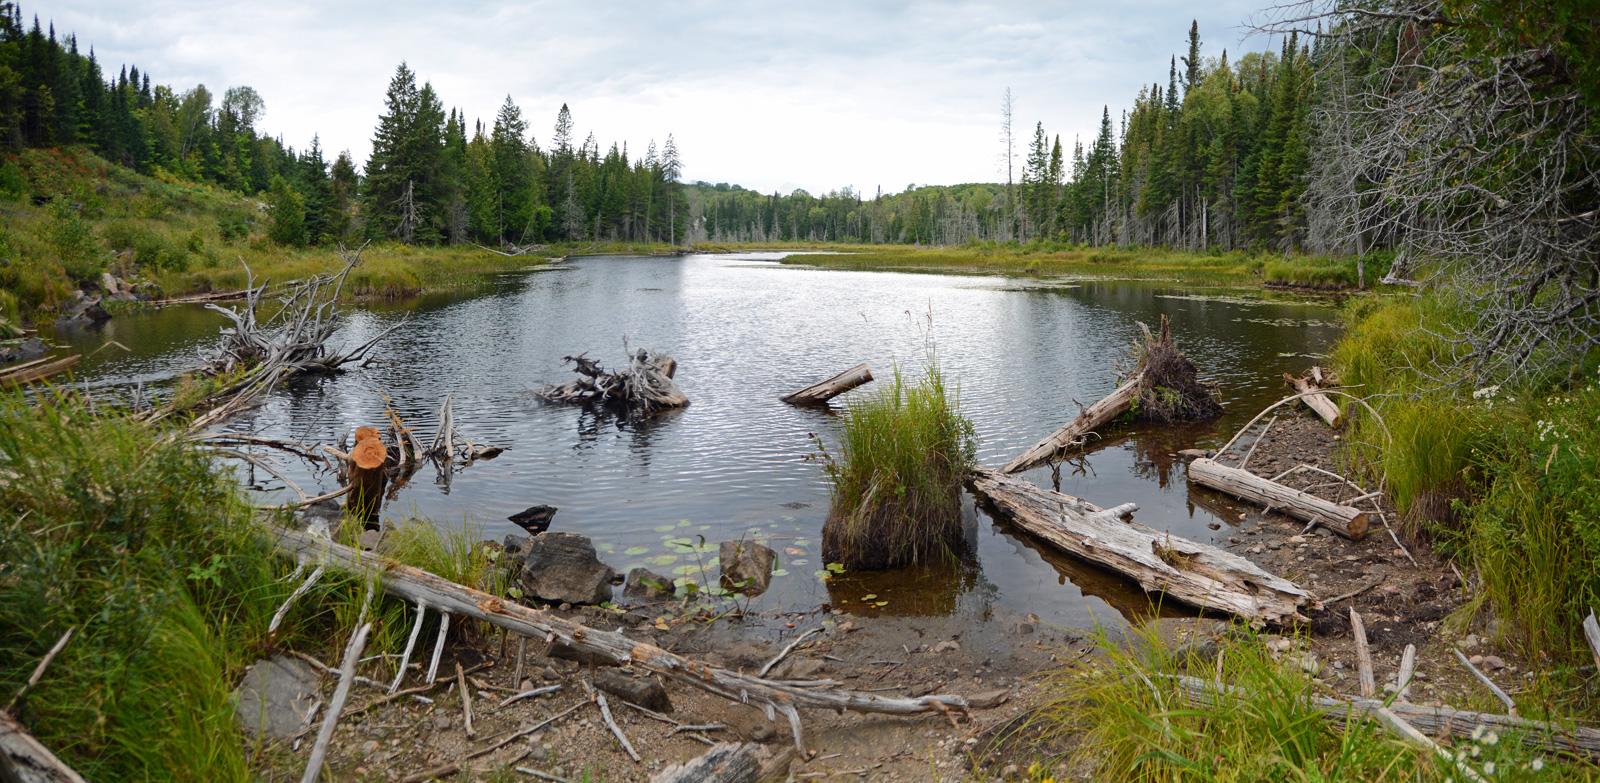 https://0901.nccdn.net/4_2/000/000/04b/787/dead-wood-lake.jpg